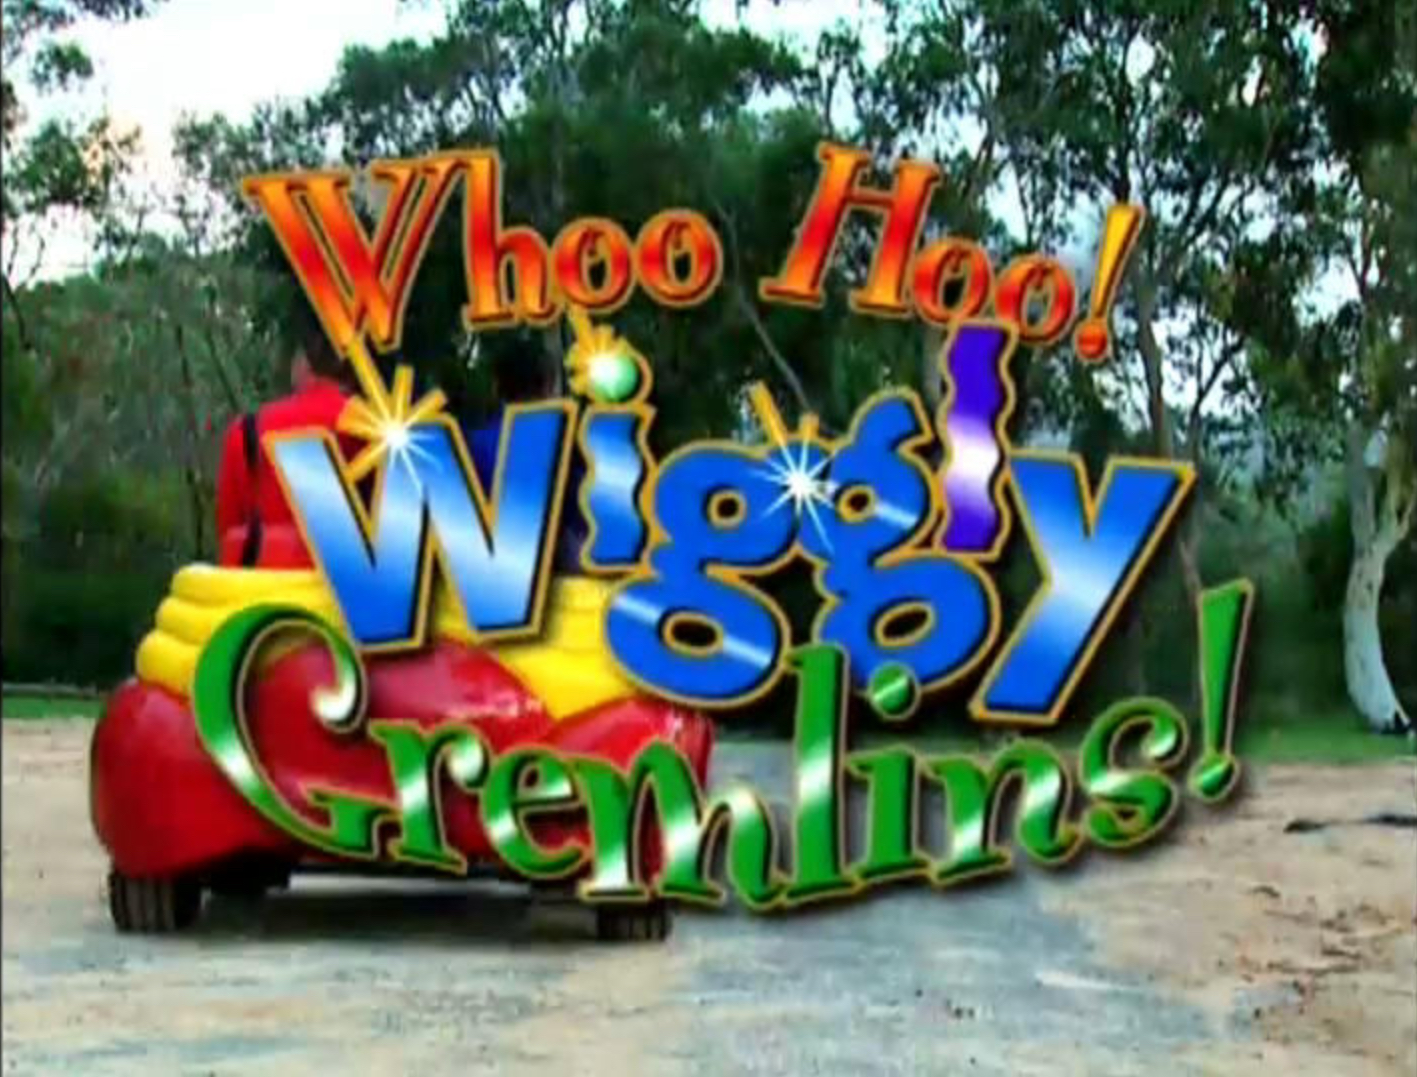 Whoo Hoo! Wiggly Gremlins! (video)/Transcript